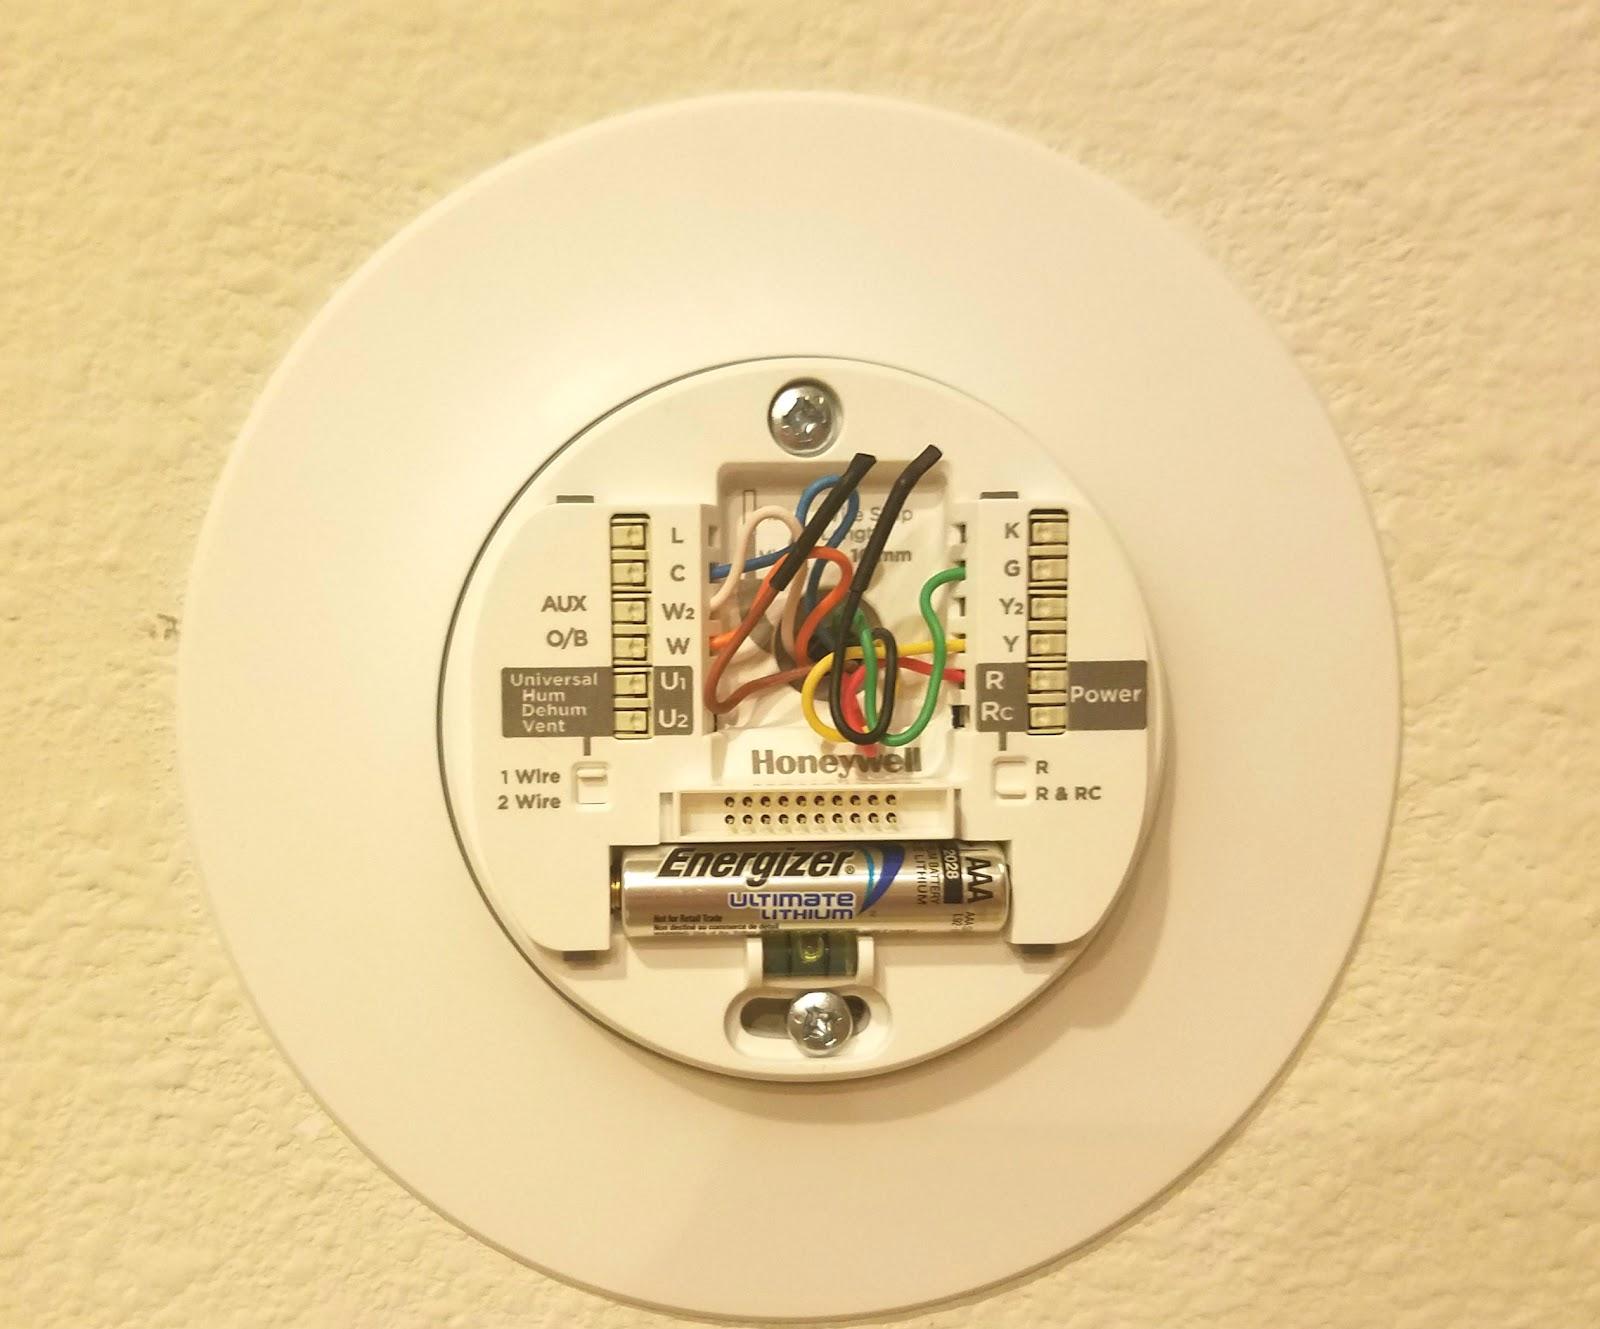 Honeywell-lyric-thermostat-9.jpg